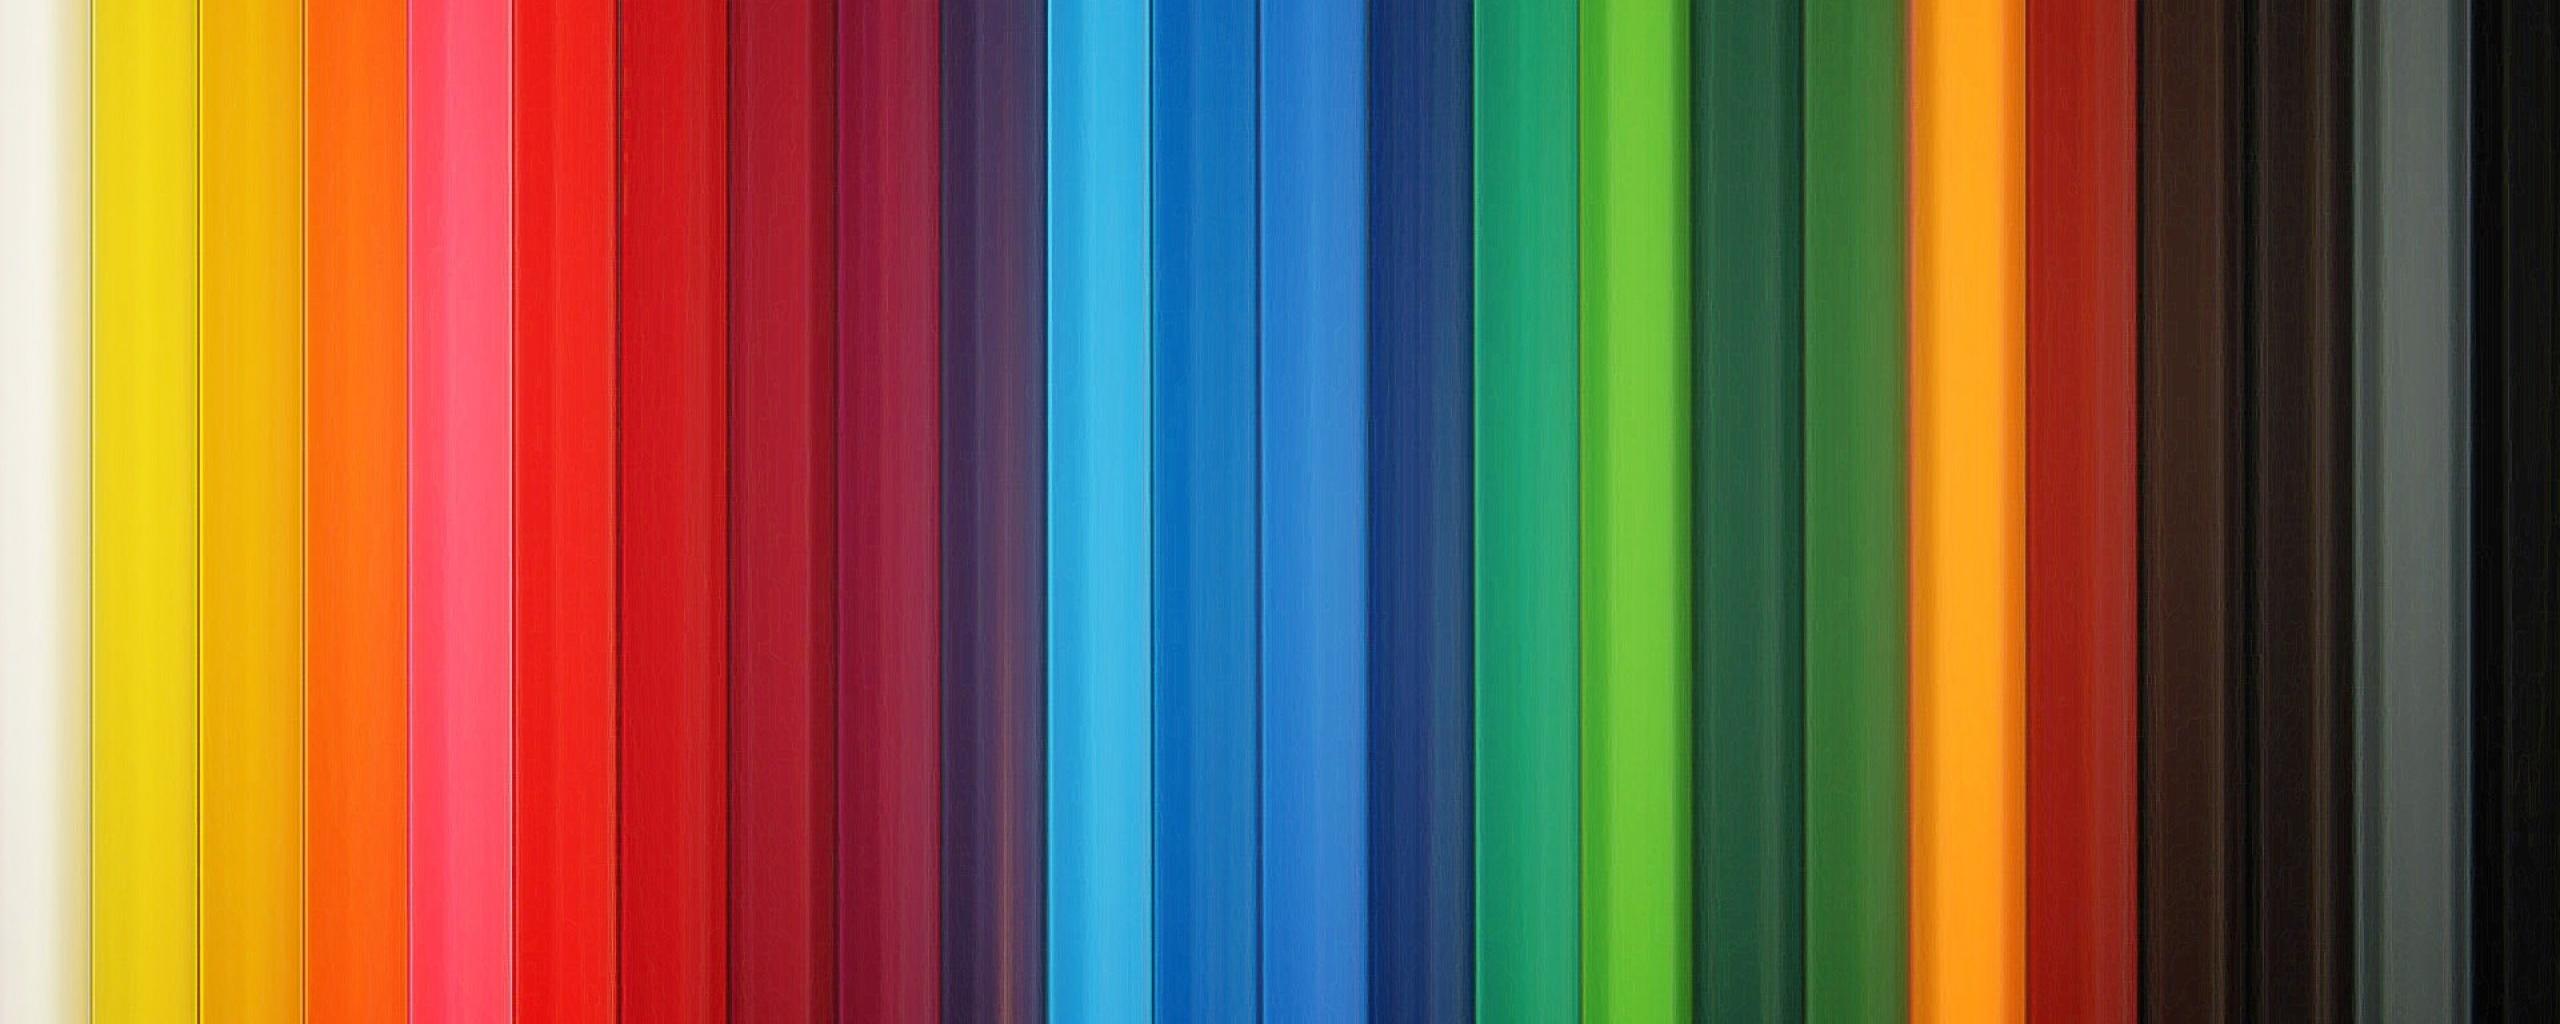 Wallpaper 2560x1024 Colorful Stripes Rainbow Vertical Dual Monitor 2560x1024